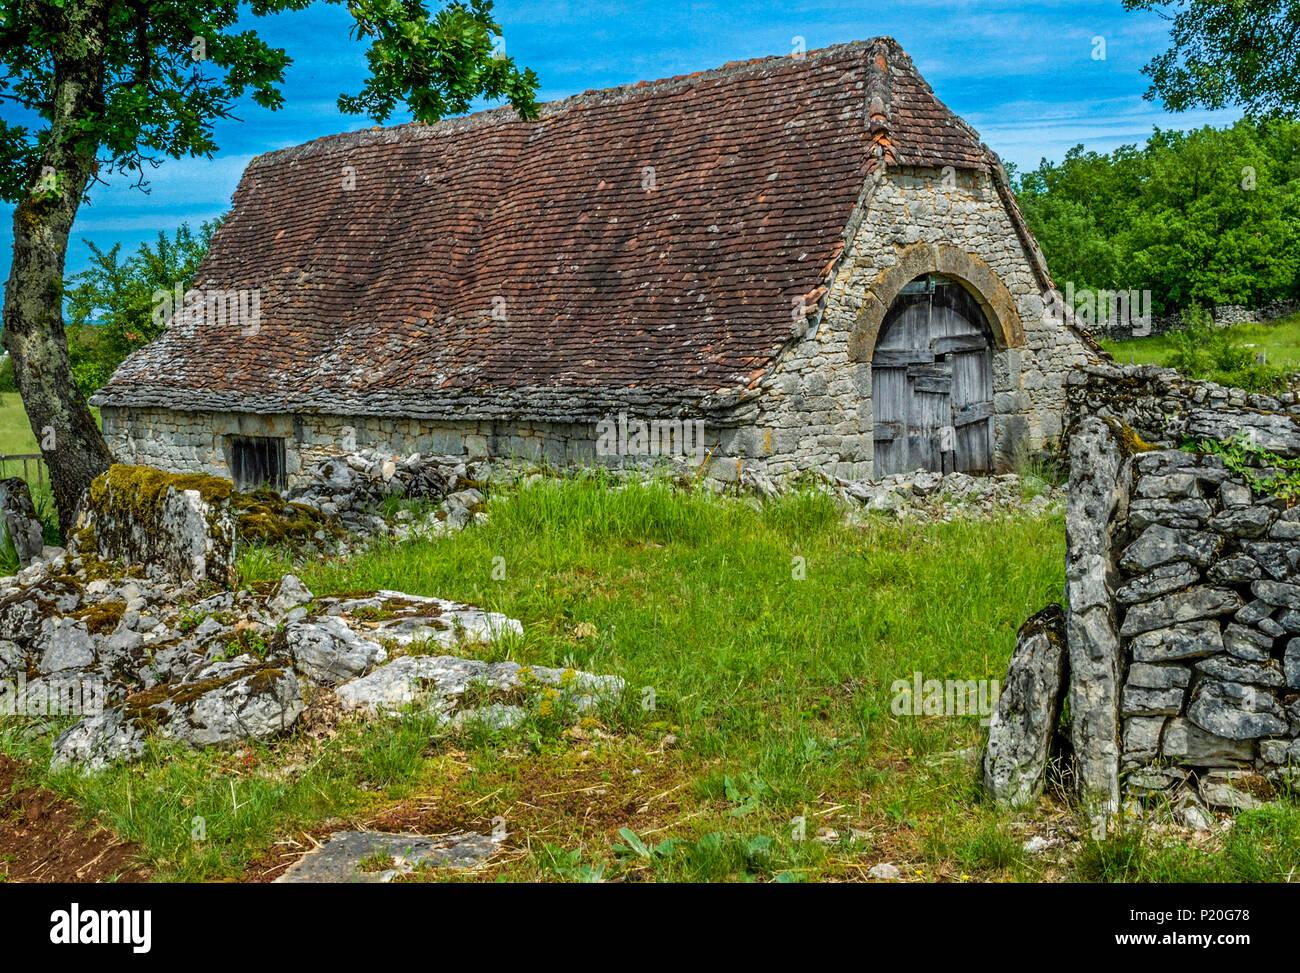 France, Lot, Causses du Quercy regional natural park, Causse de Gramat, Padirac region, dry-stone barn in Barrieres hamel, abandonned since WWI Stock Photo